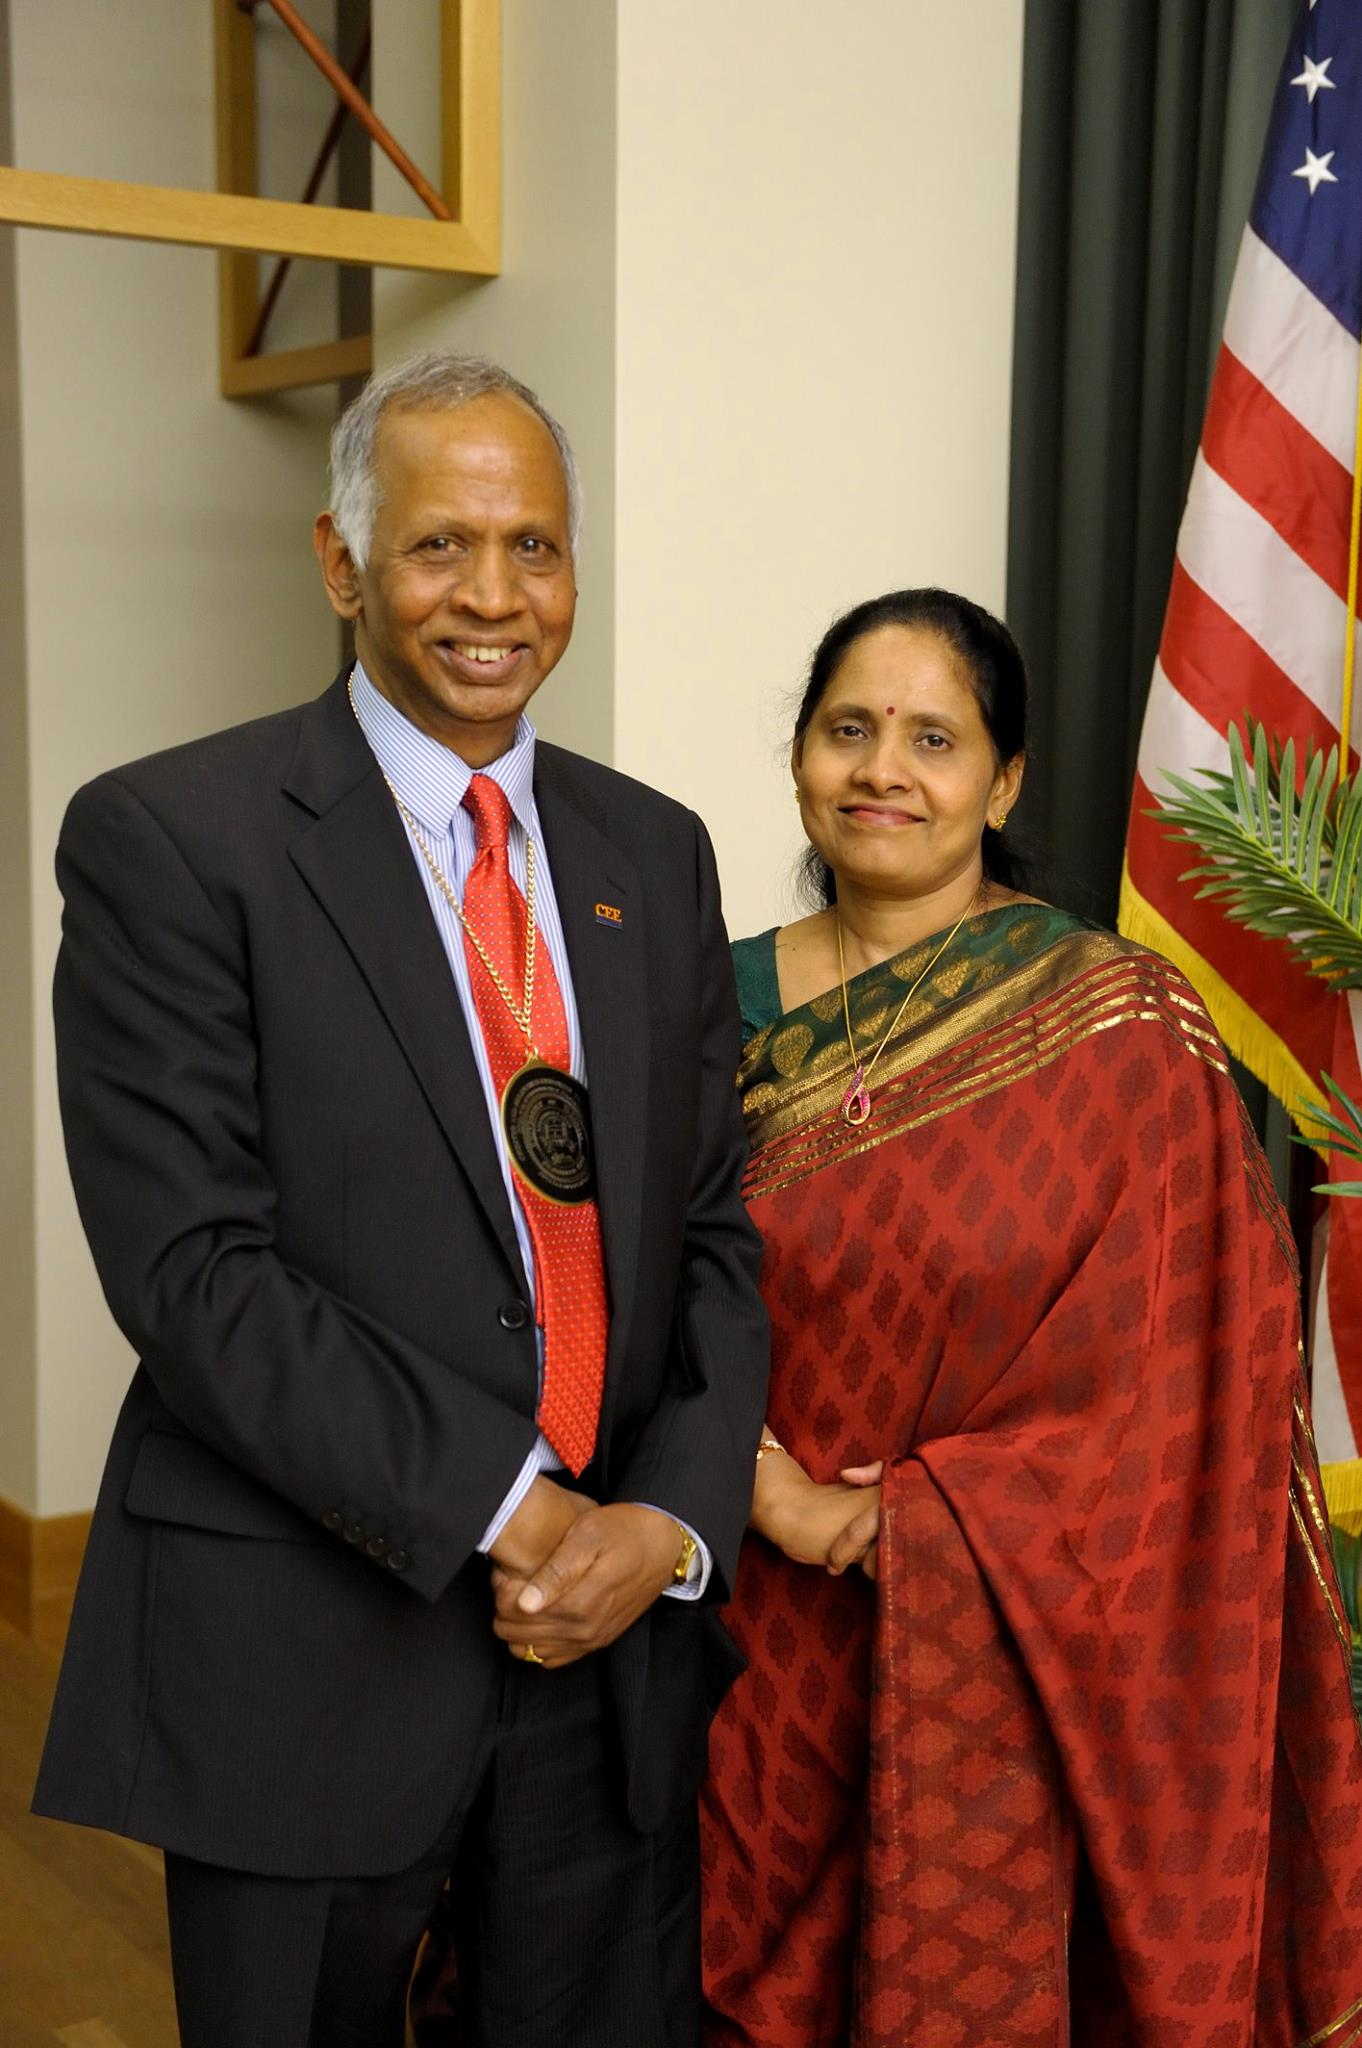 Prof. Murugesu Sivapalan with wife Banumathy